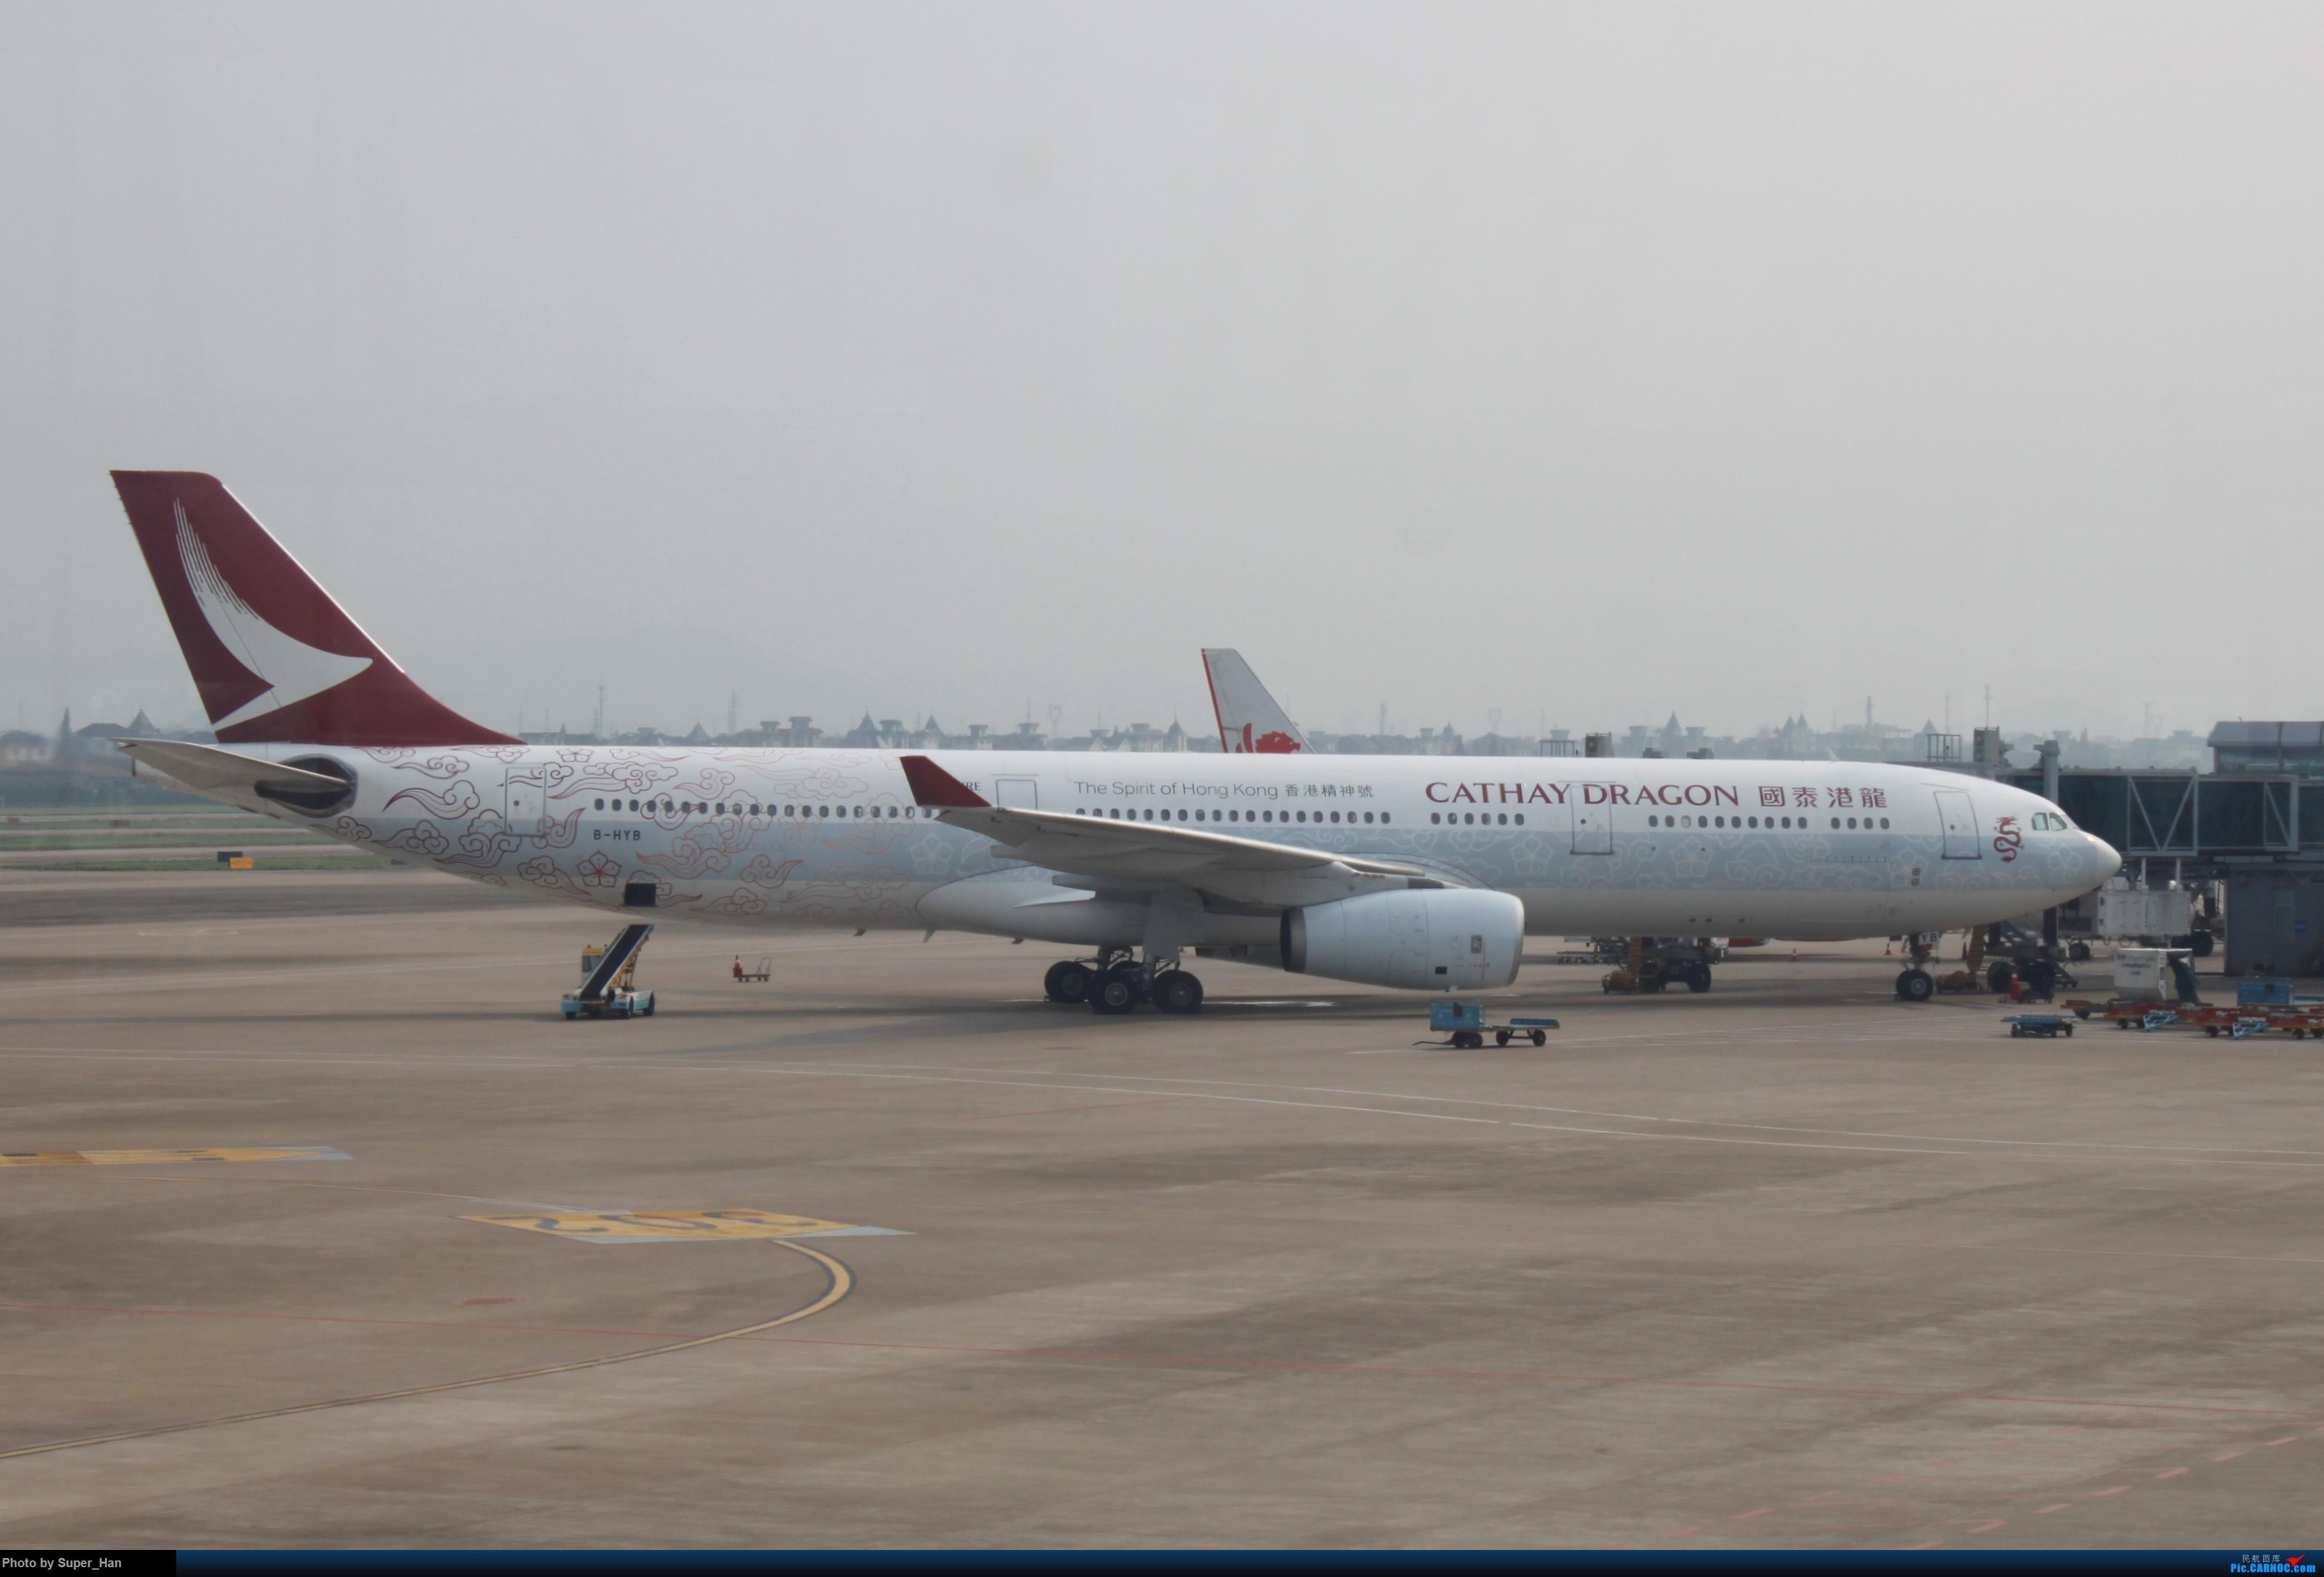 Re:[原创]HGH-SZX CAN-SHA AIRBUS A330-300 B-HYB 中国杭州萧山国际机场